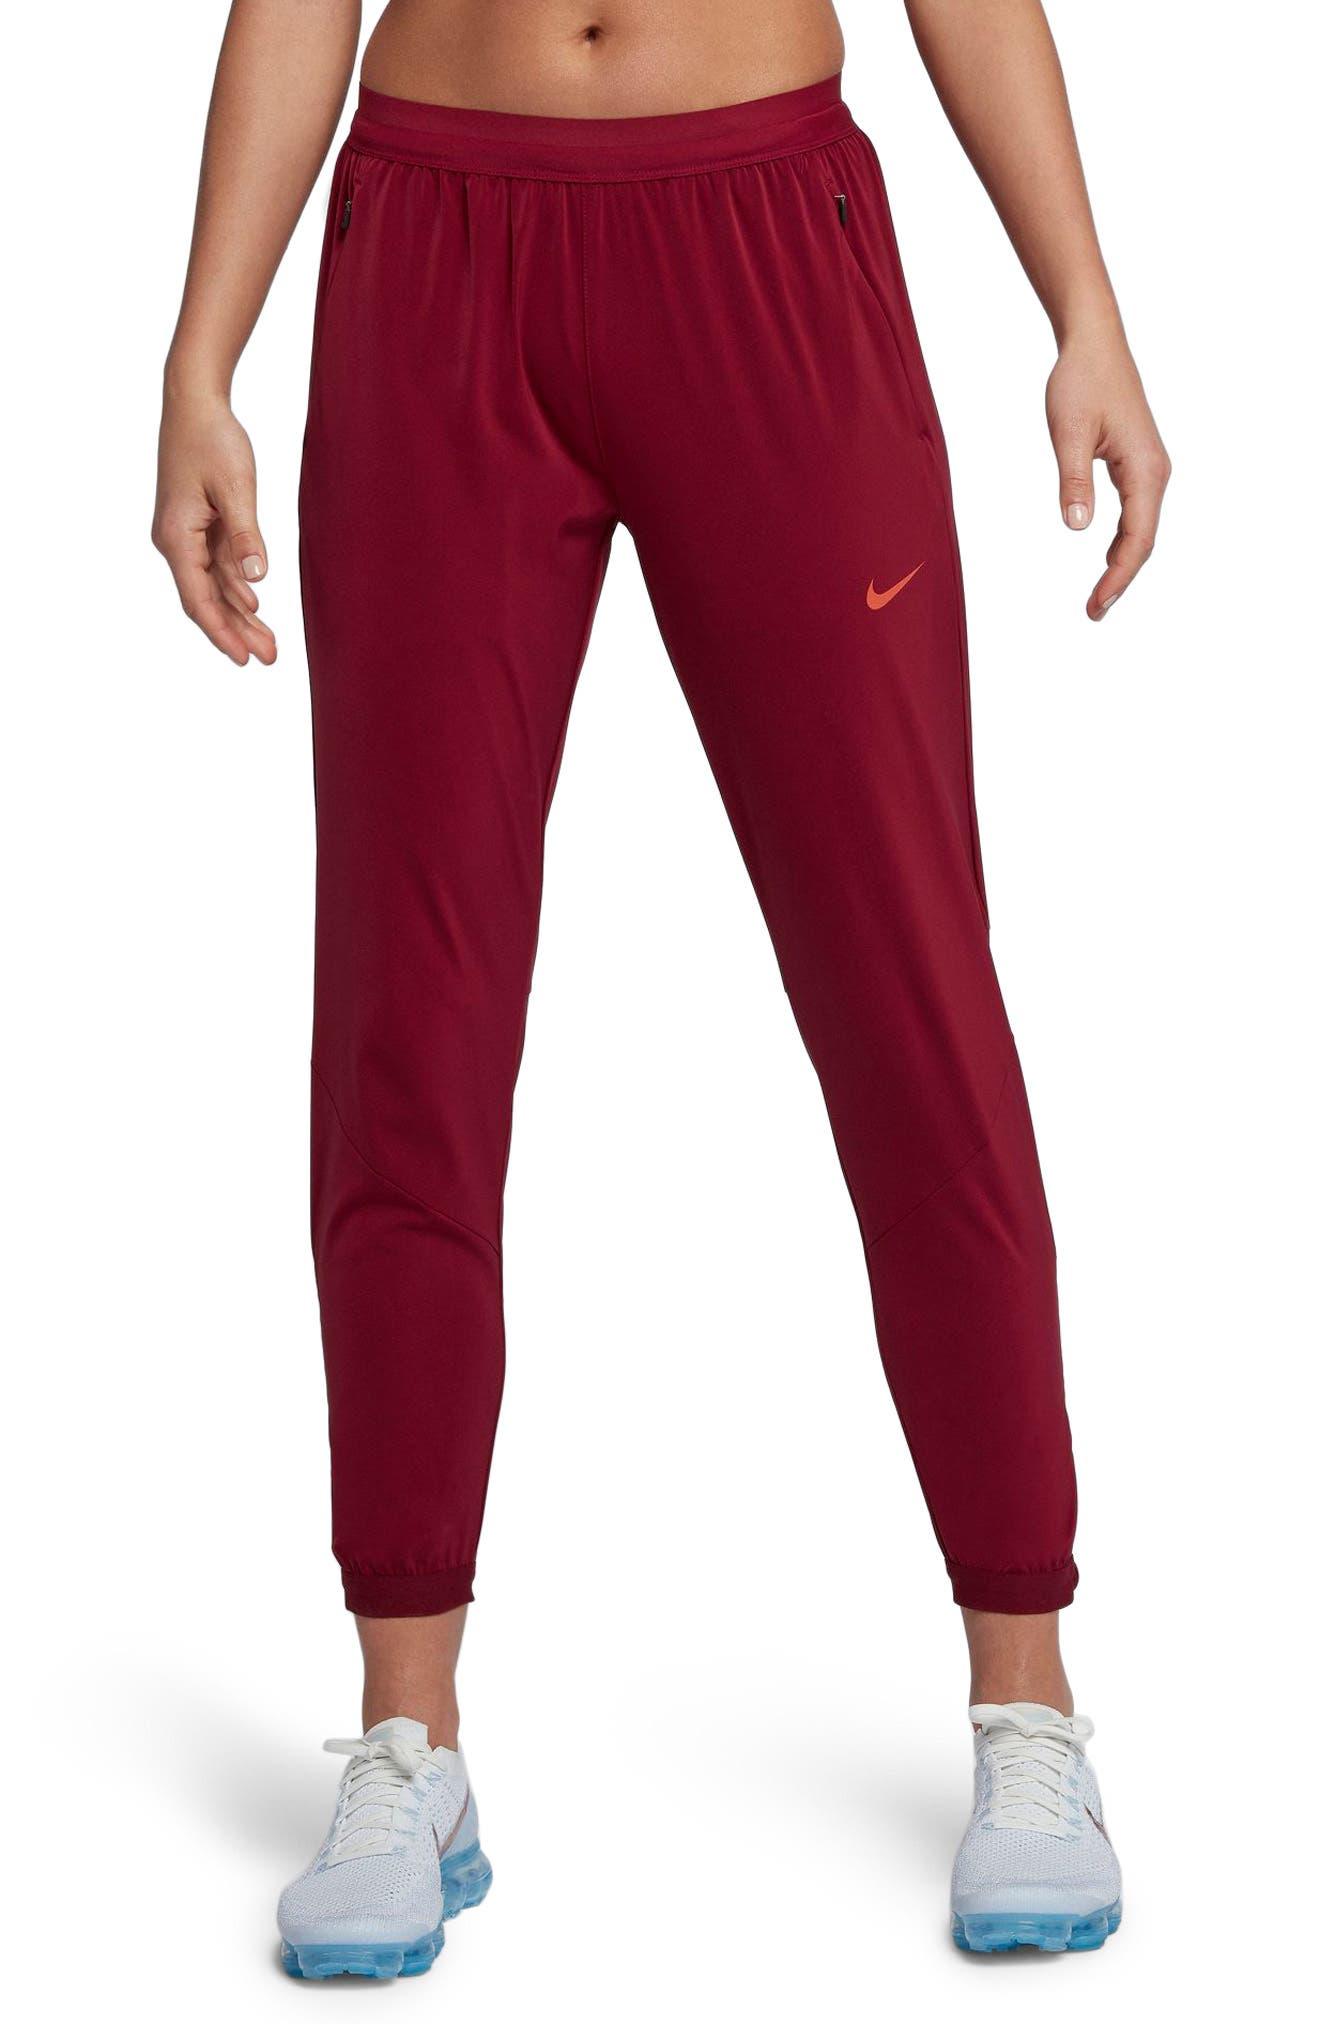 Women's Dry Running Stadium Pants,                             Main thumbnail 1, color,                             600